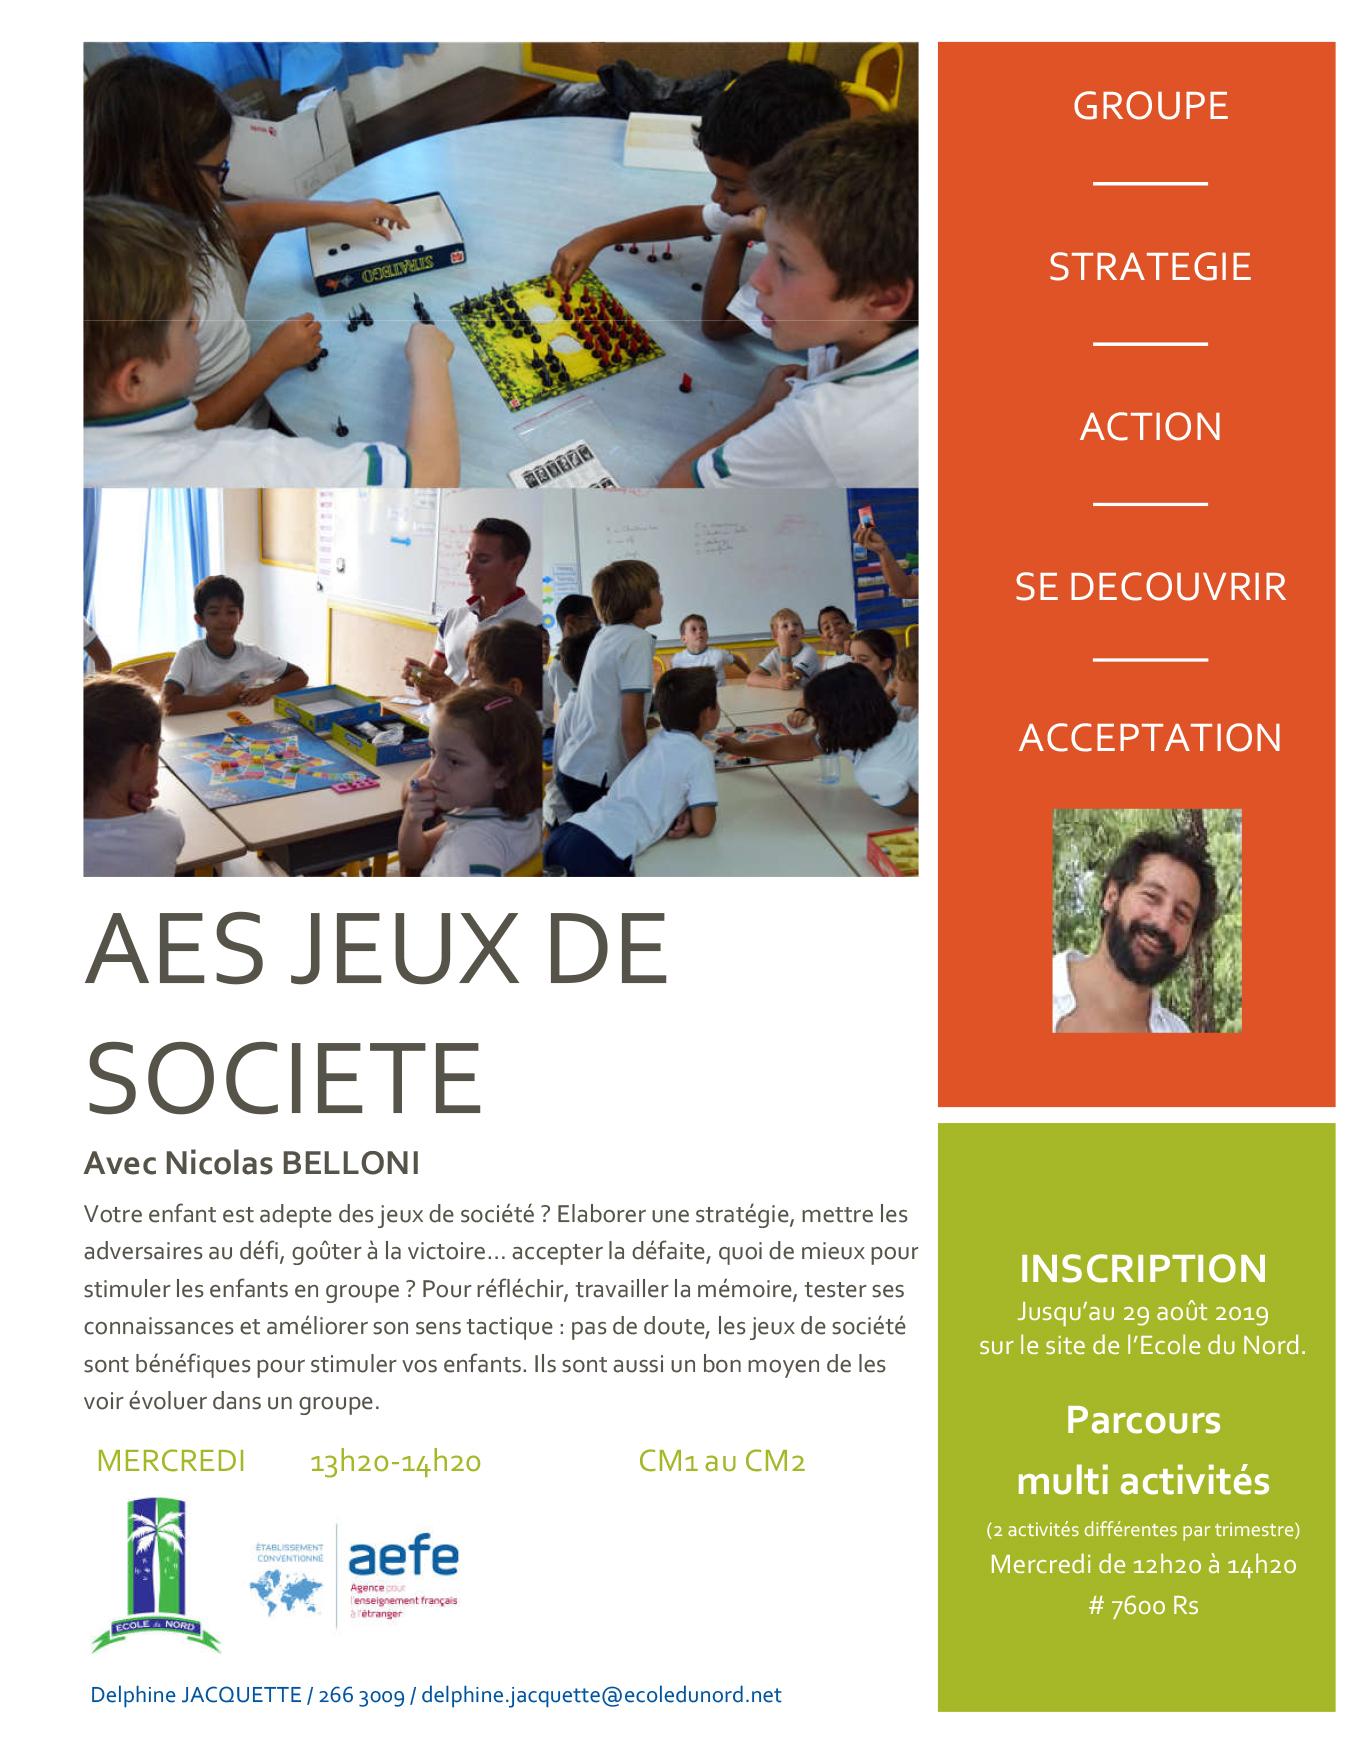 AES 2019-2020 fiches-51 copie